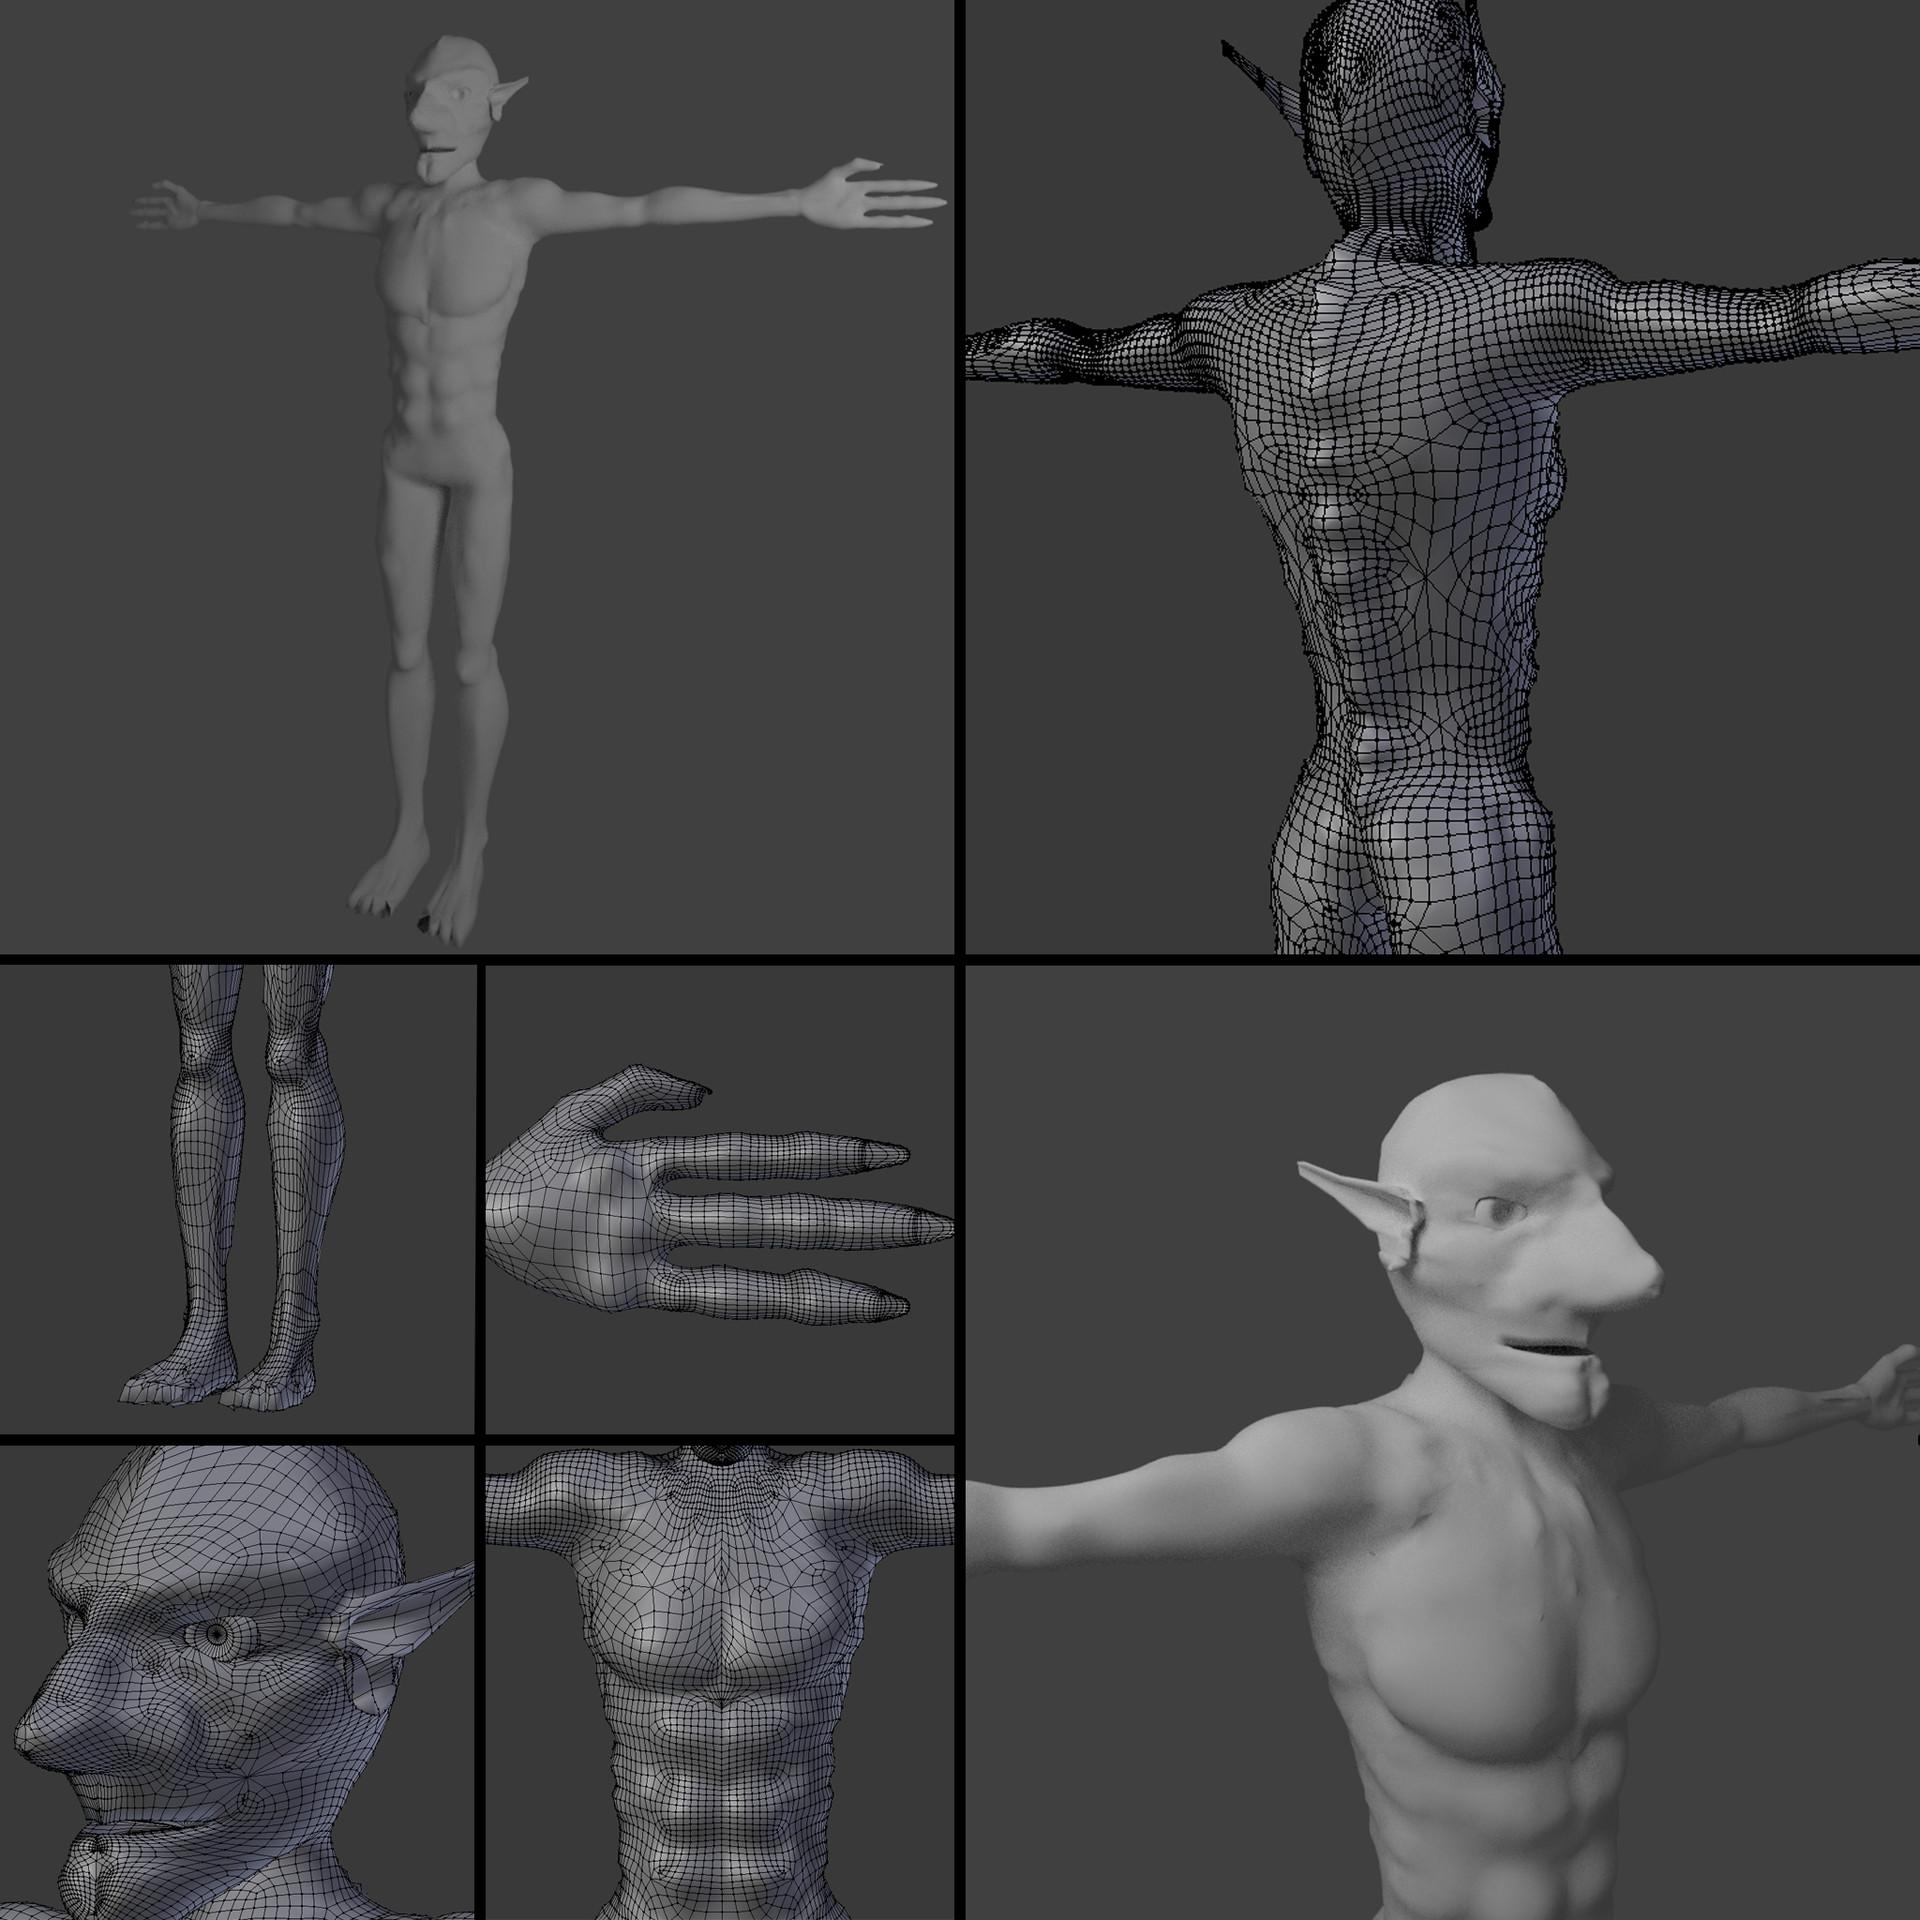 ArtStation - My character modeling progress , Dawid Tomczyk